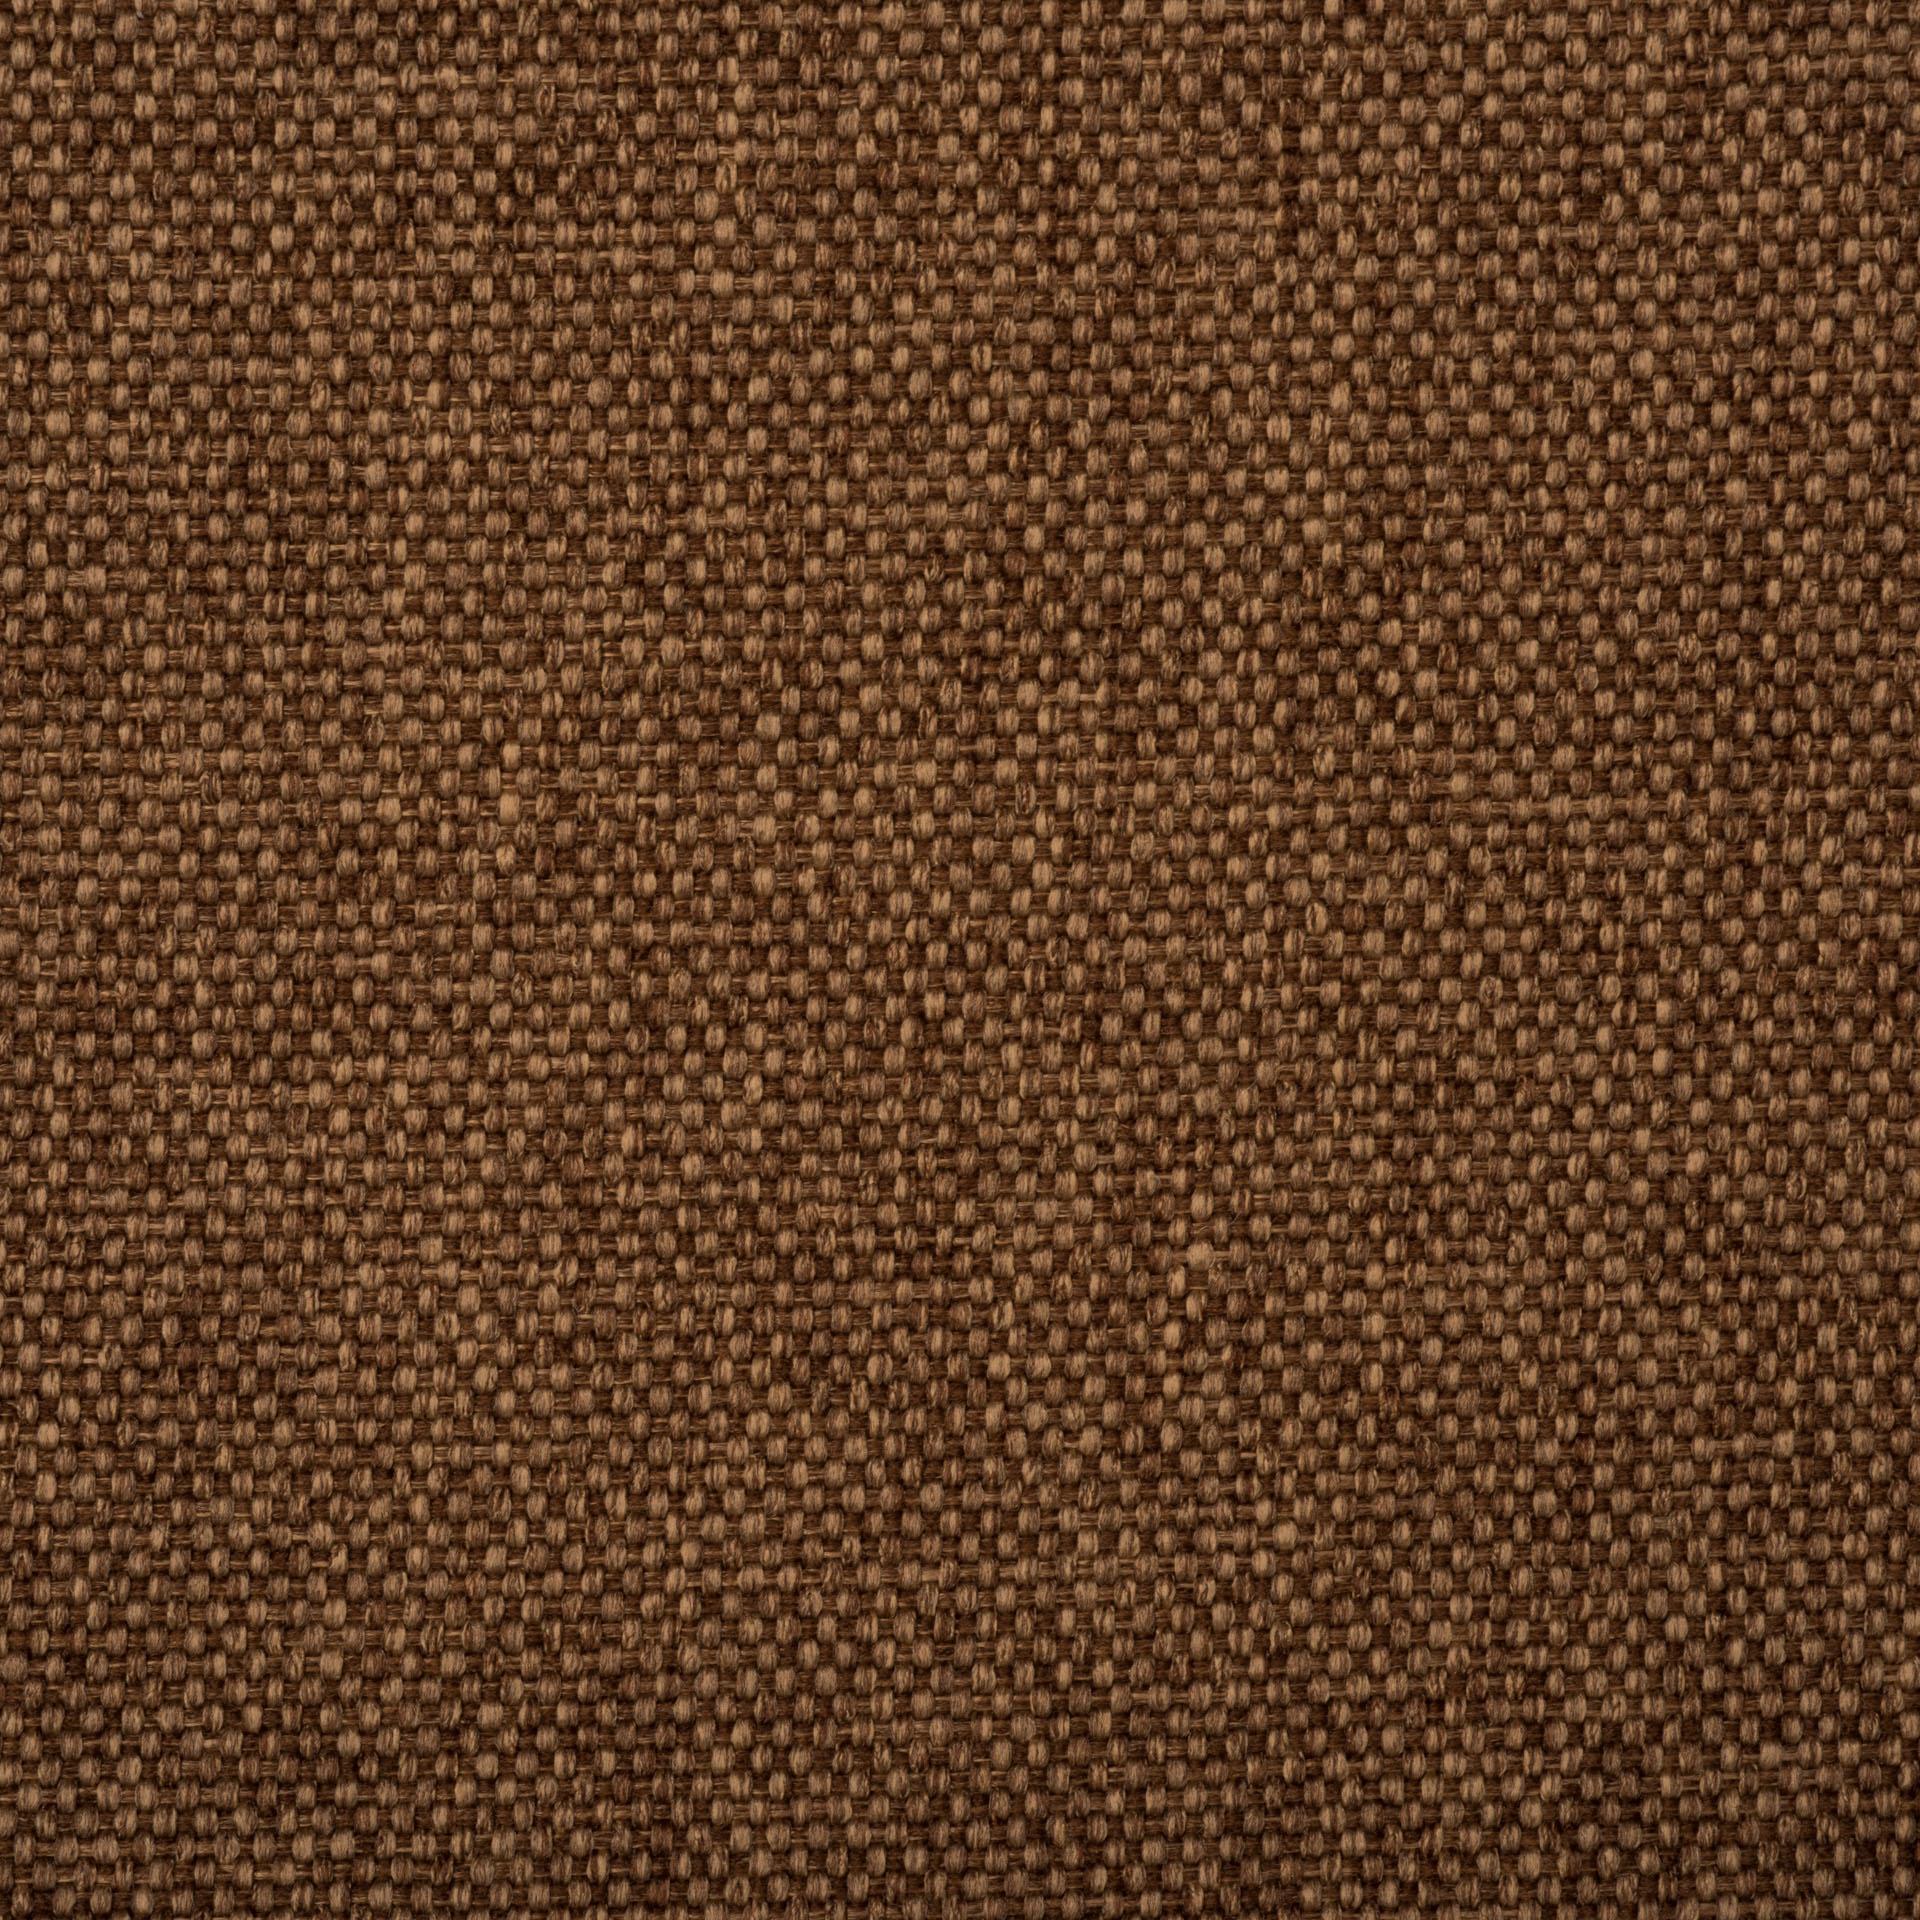 Коллекция ткани Багама 06 Gold Brown,  купить ткань Жаккард для мебели Украина